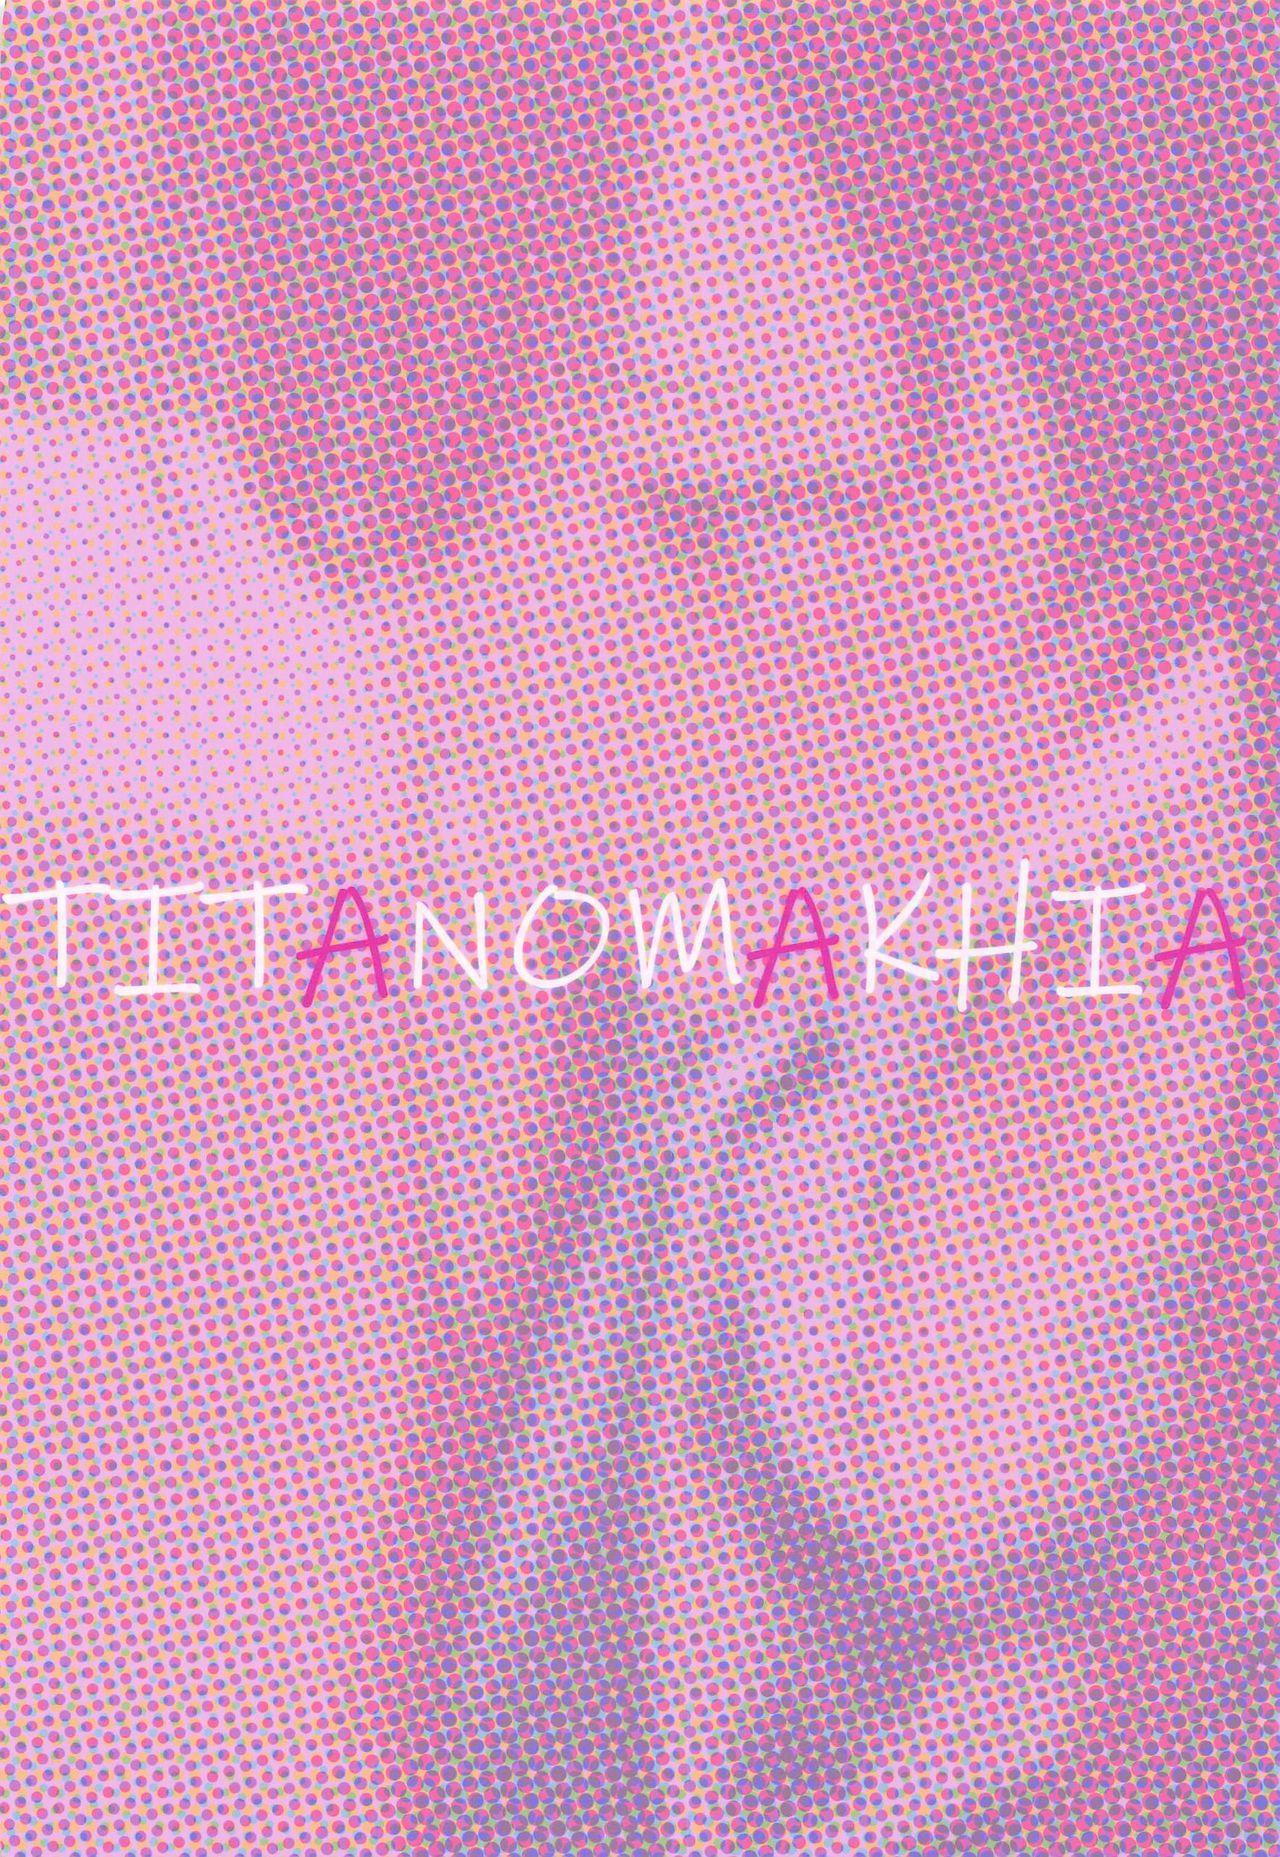 """Anone, P-san Amana..."" 61"